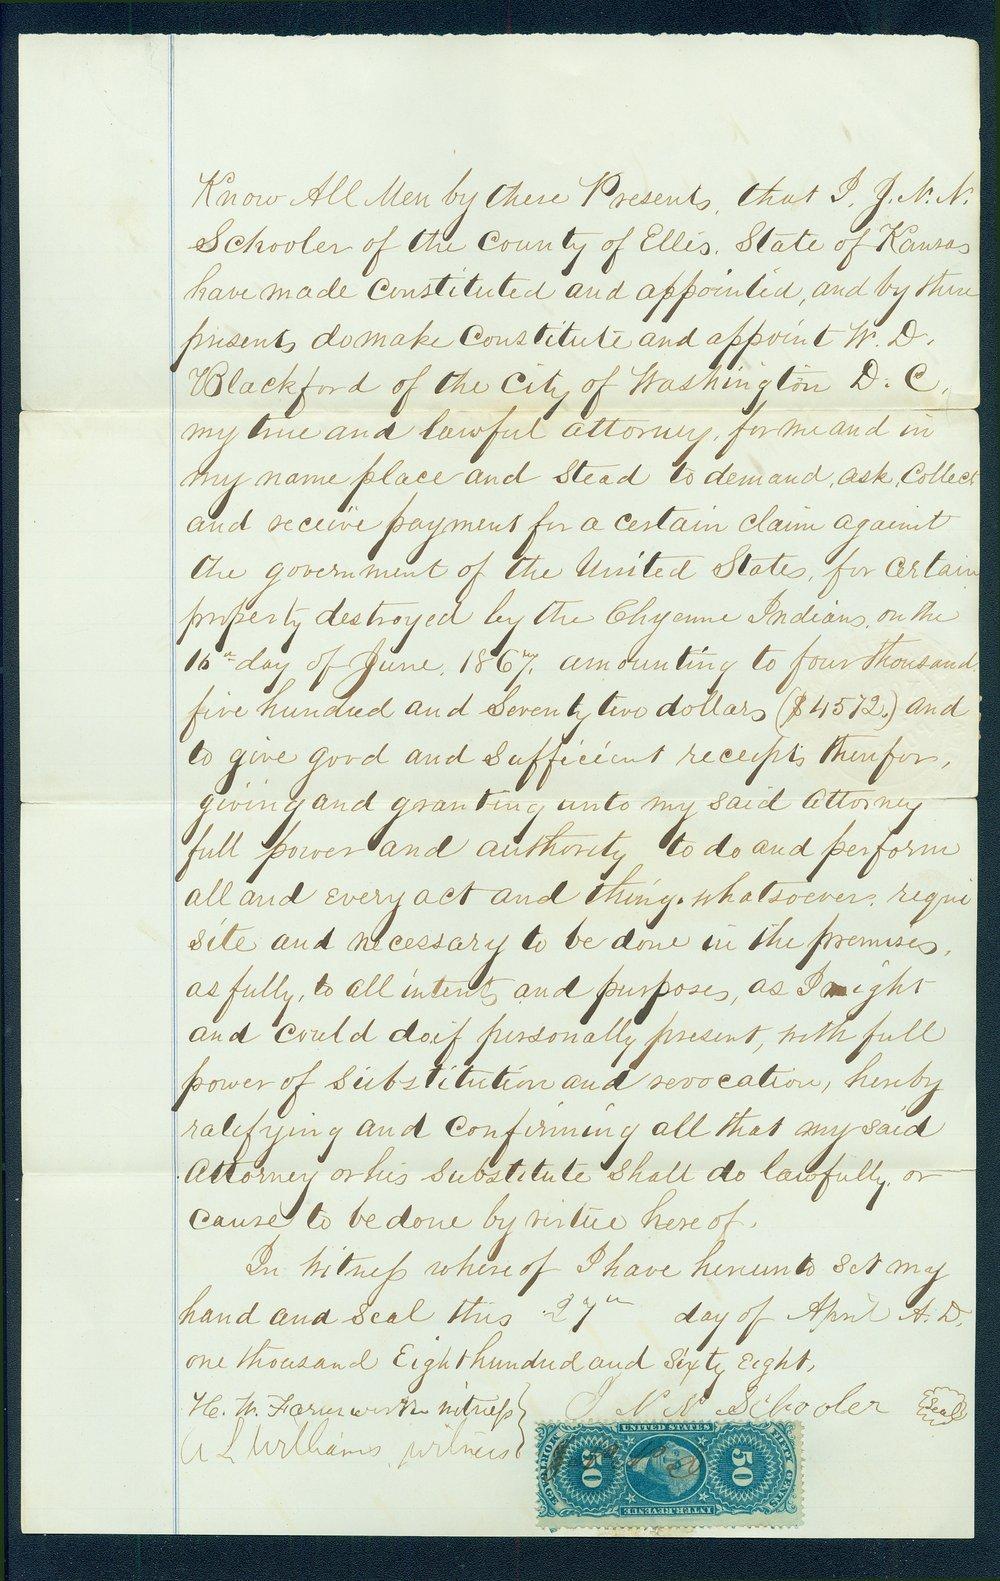 Letter by J.N.N. Schooler declaring William D. Blackford his attorney - 1